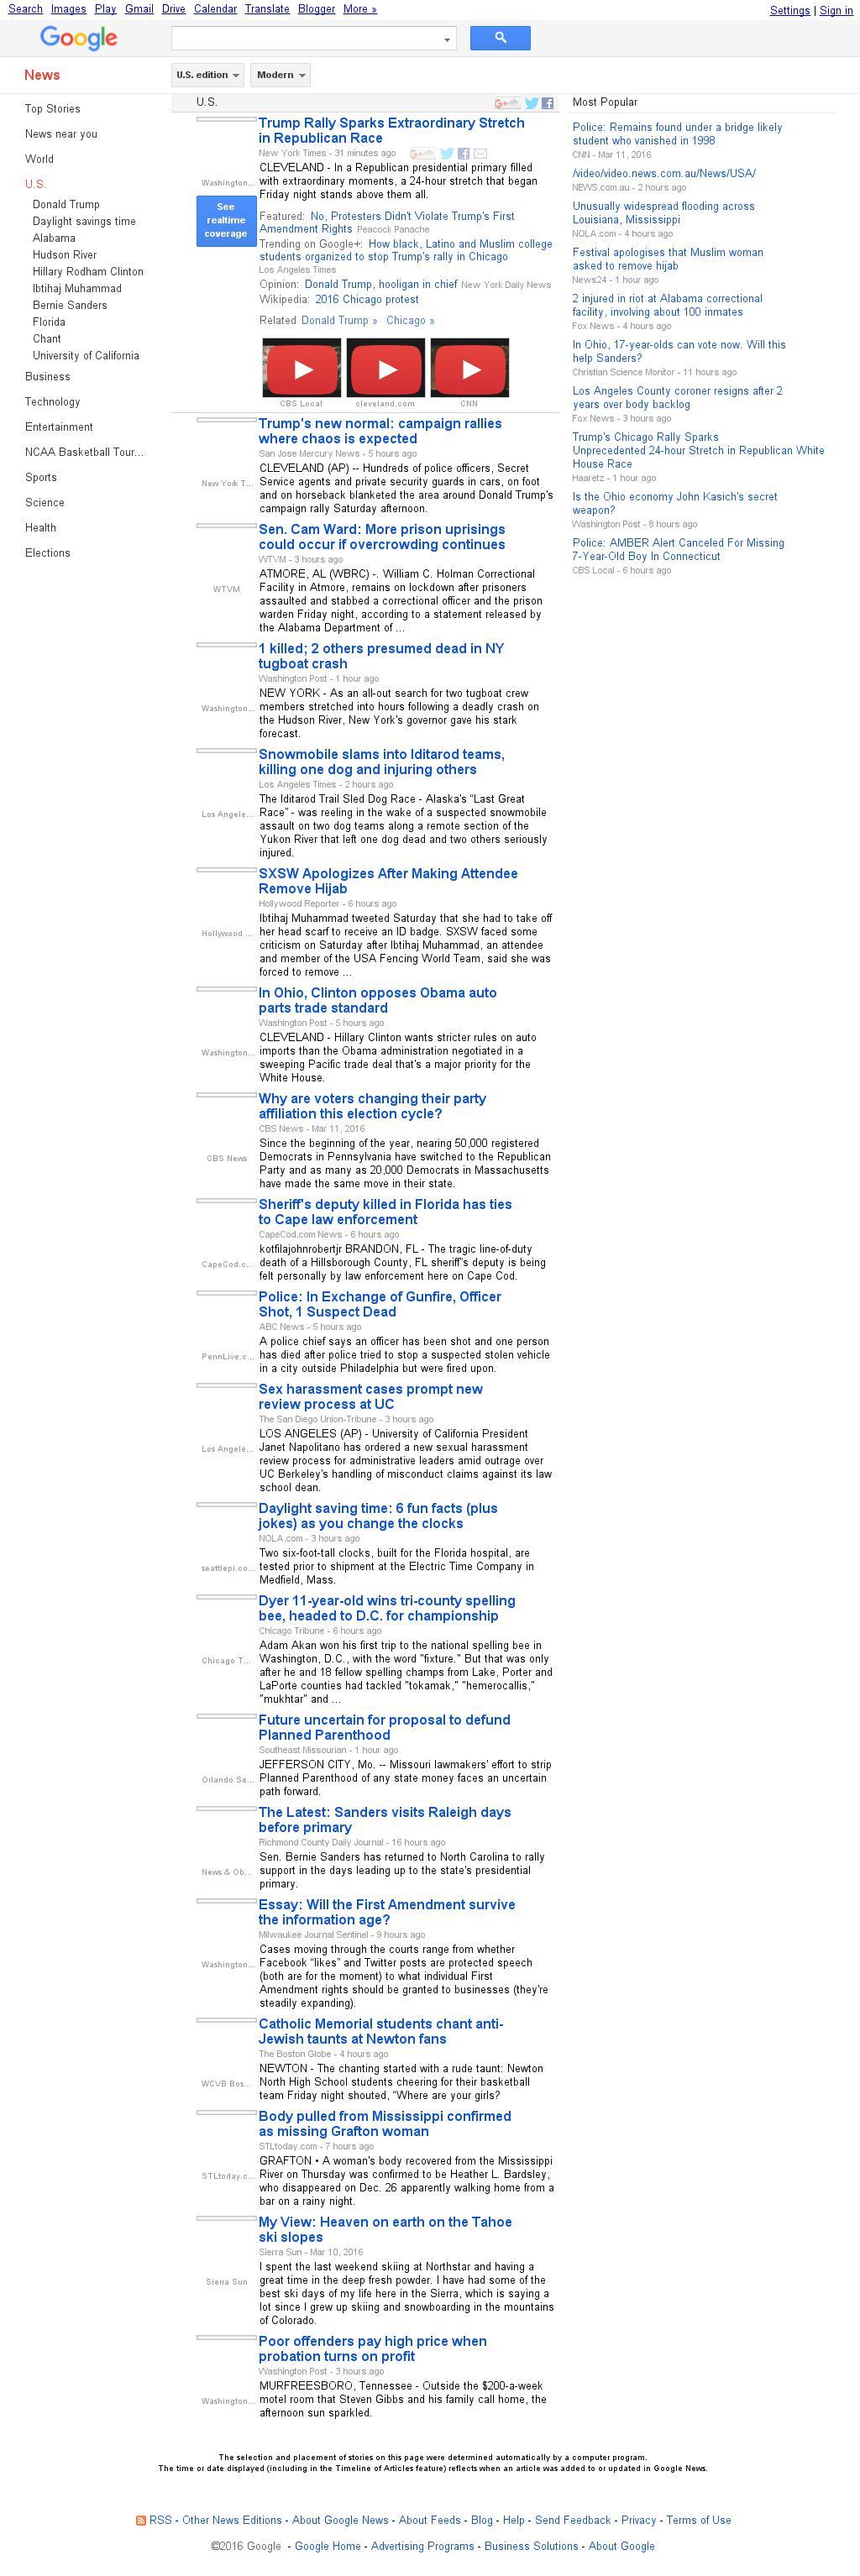 Google News: U.S. at Sunday March 13, 2016, 8:10 a.m. UTC